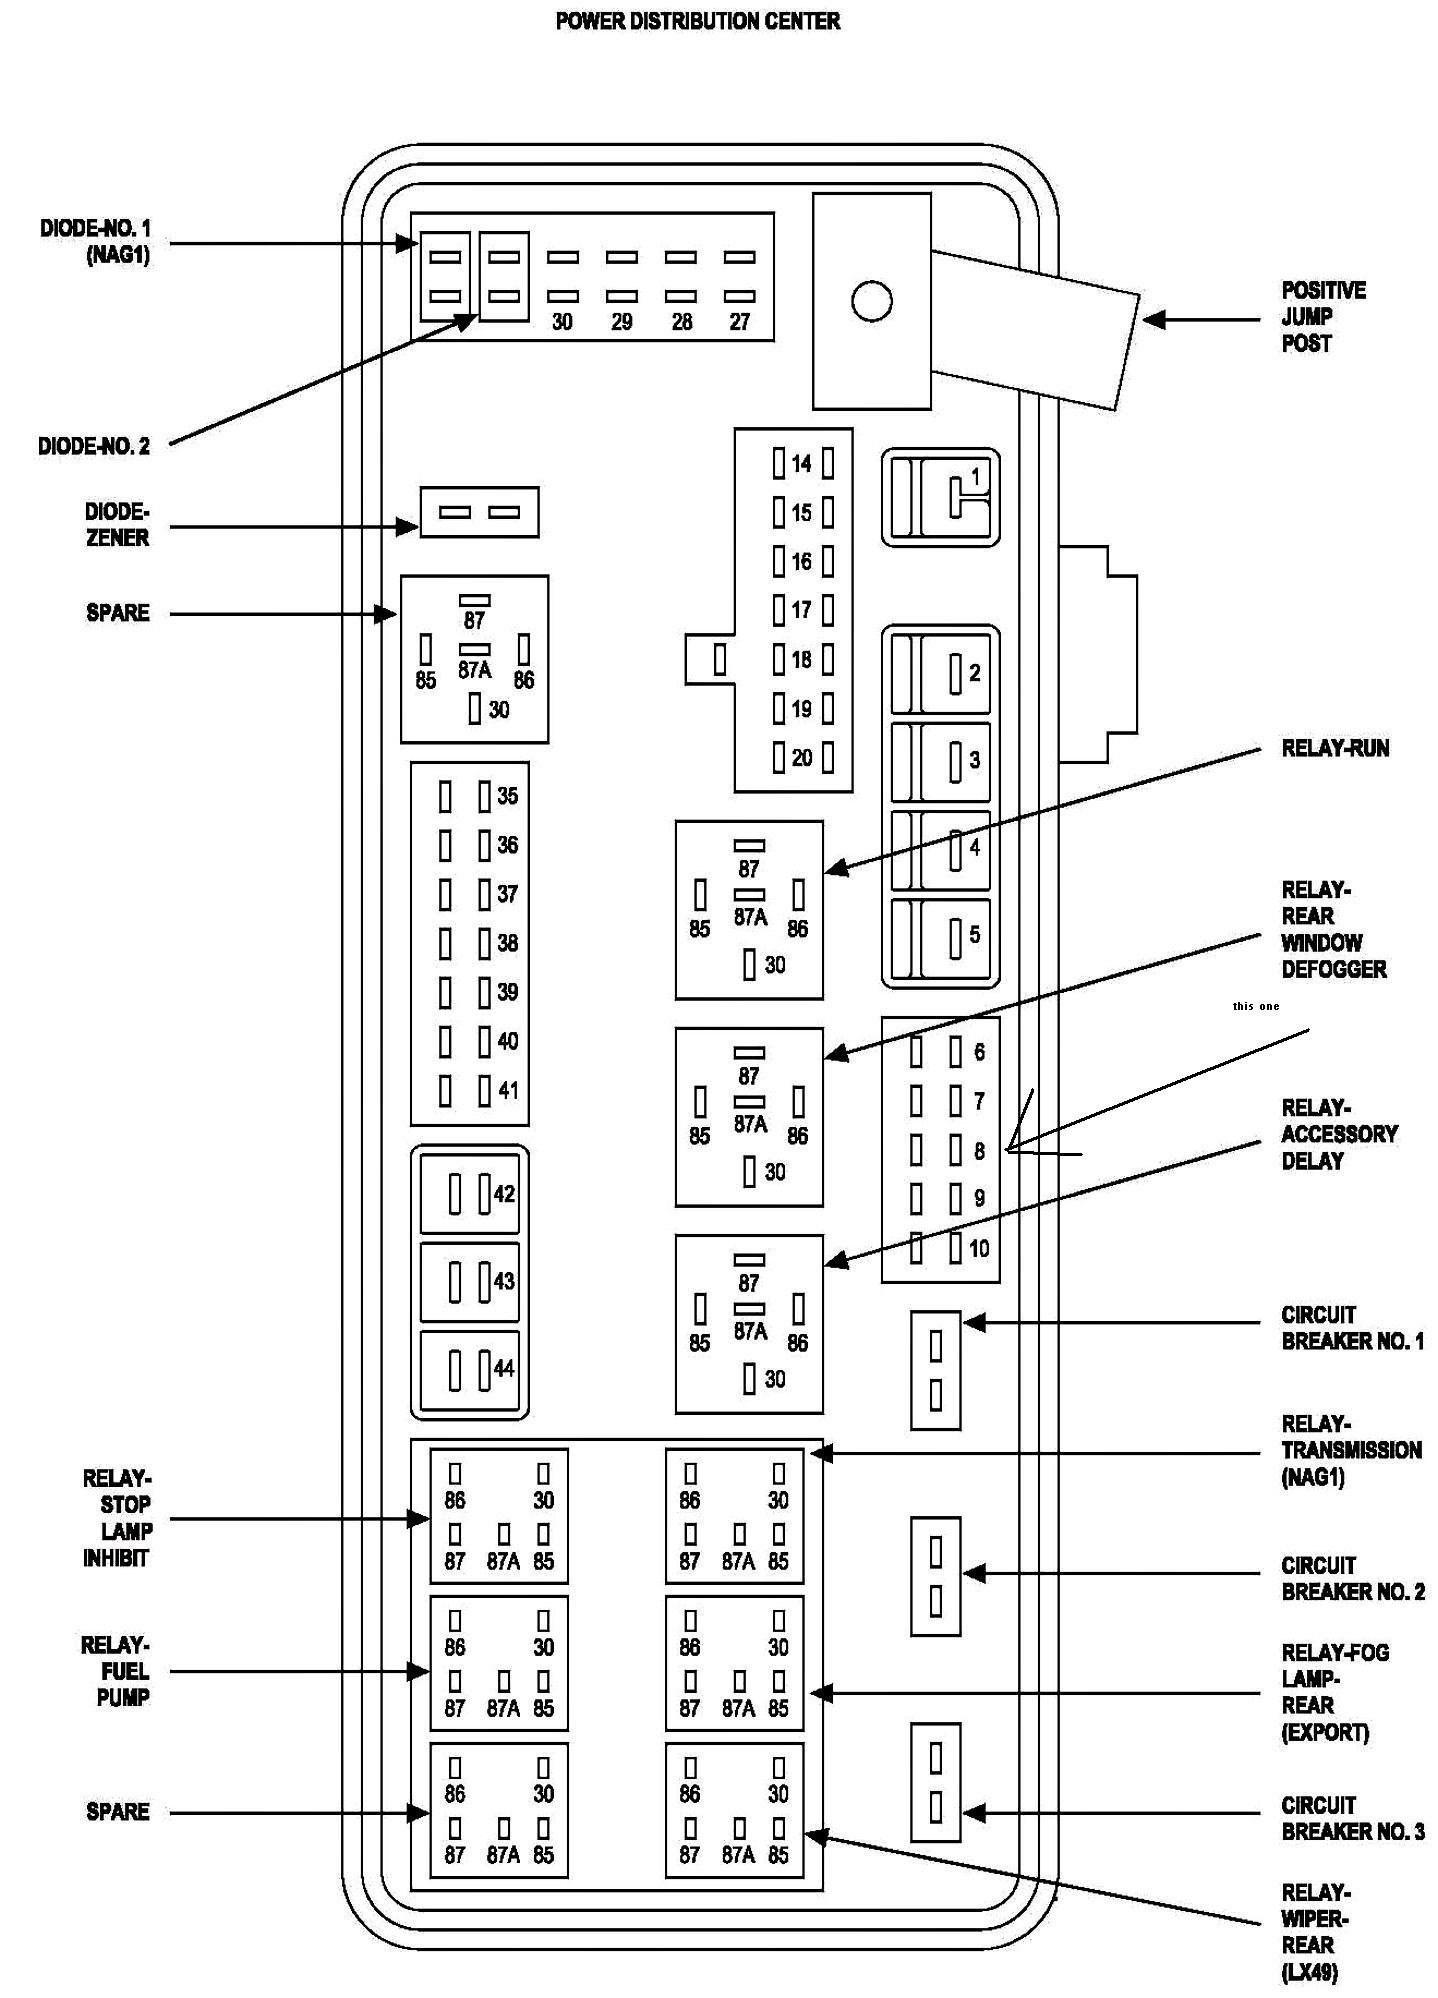 1985 Dodge Ram Fuse Box Diagram - Wiring Diagrams Hubs - Dodge Ram 1500 Wiring Diagram Free